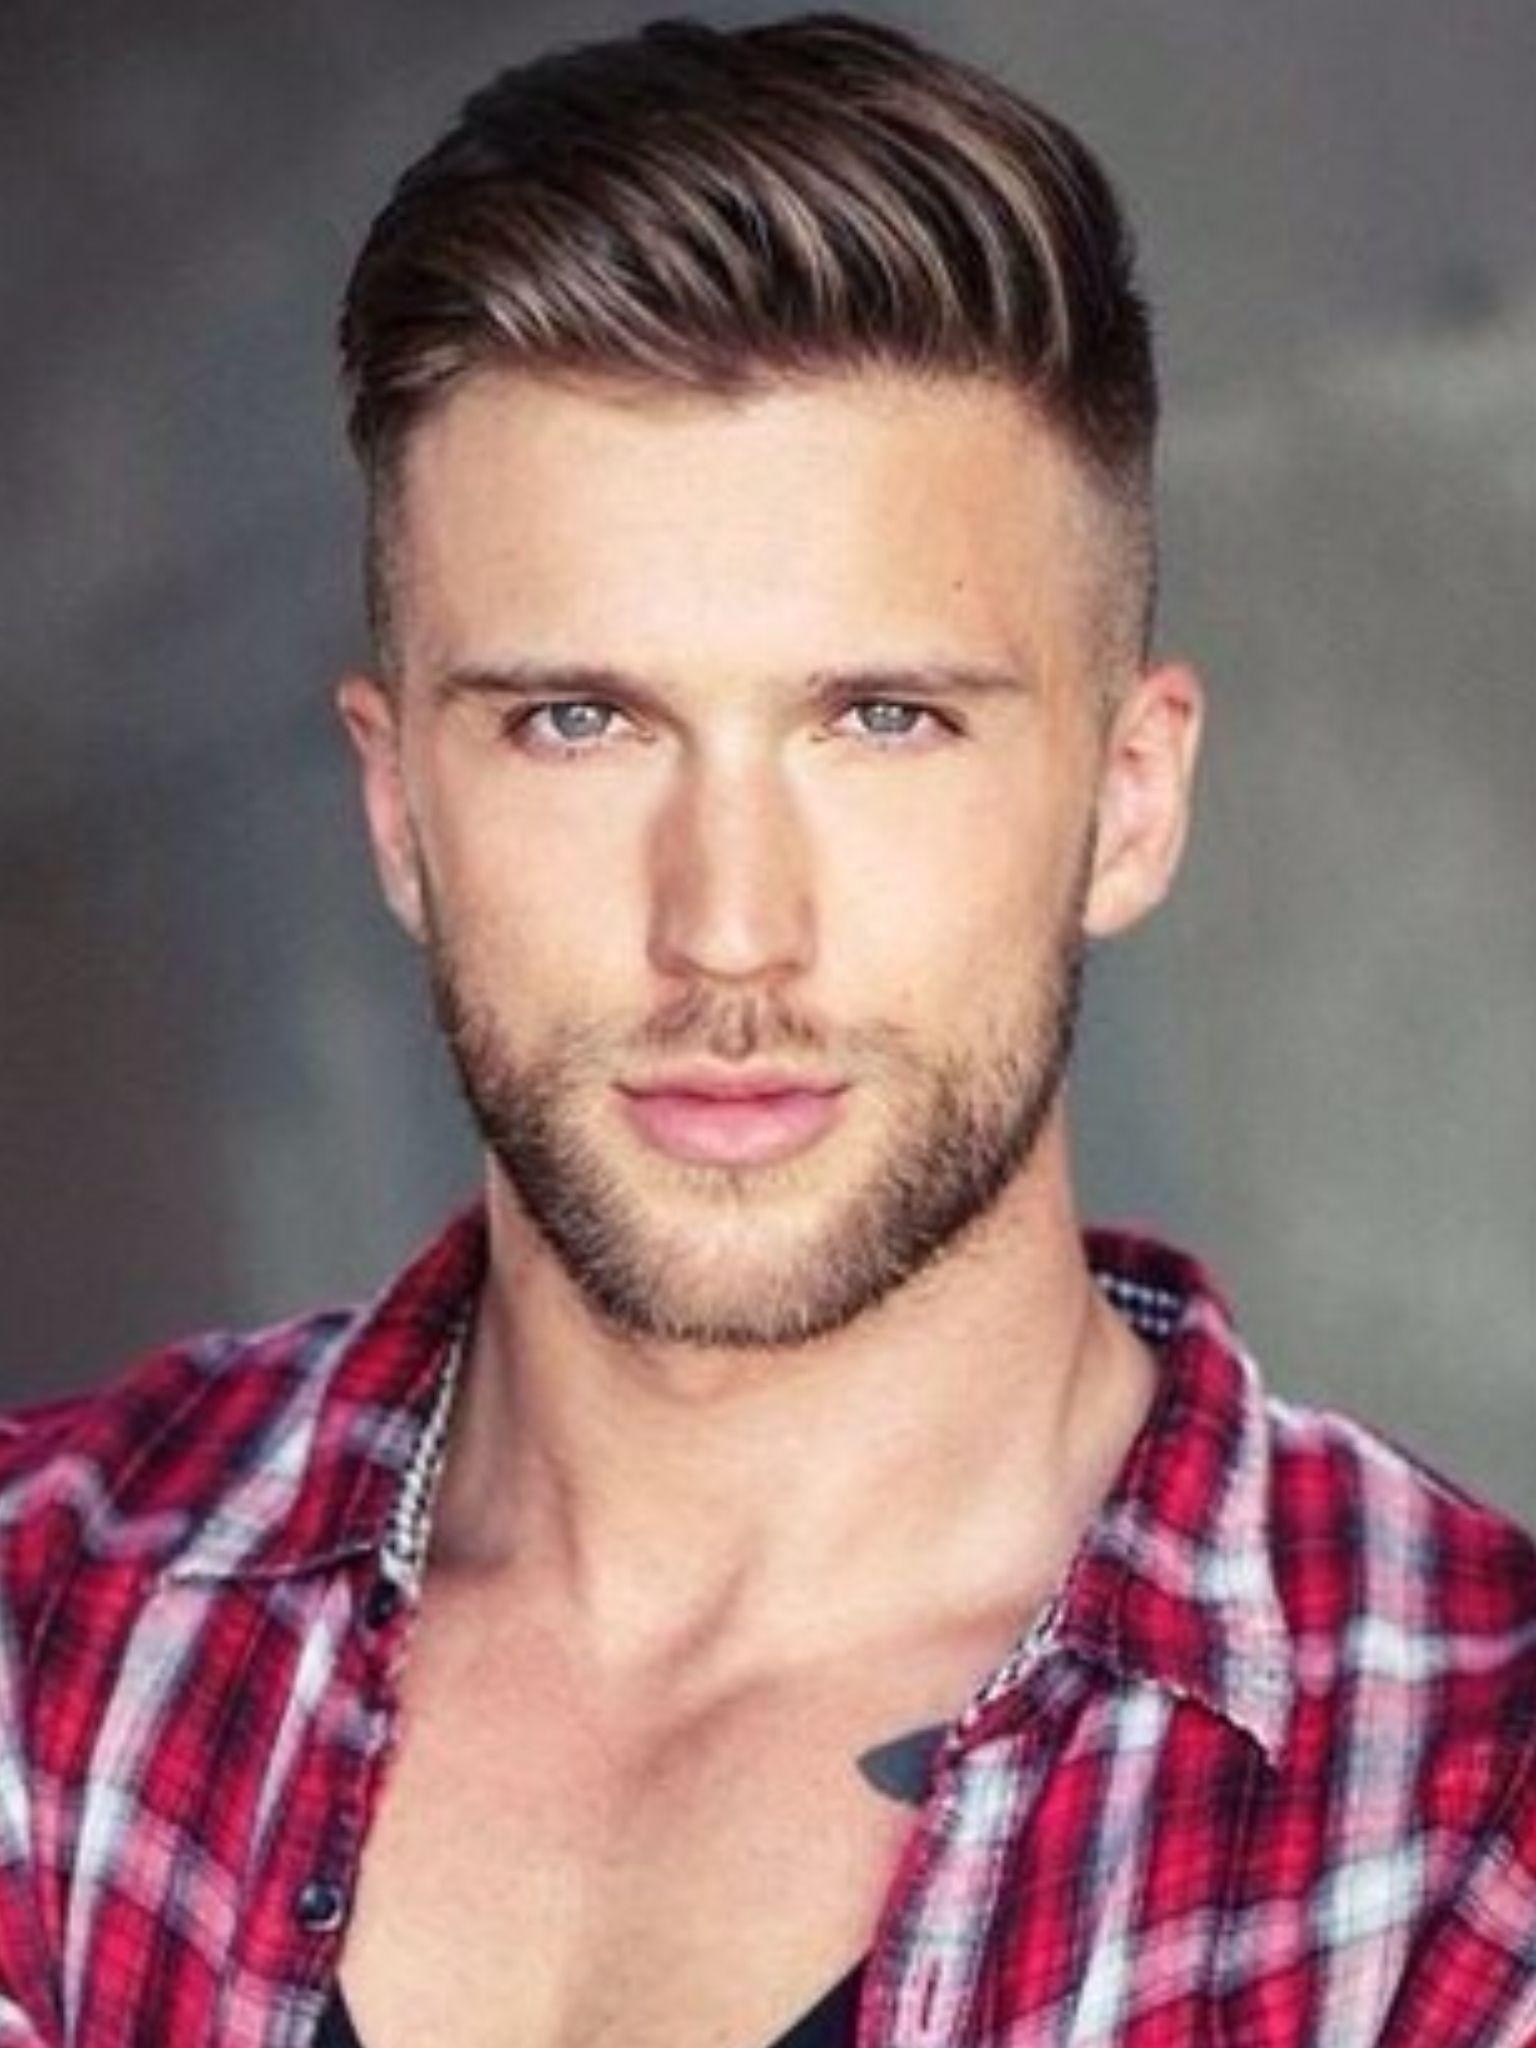 Haircuts styles for mens menus wear  fashion for men  mode homme  haïr  barbershop